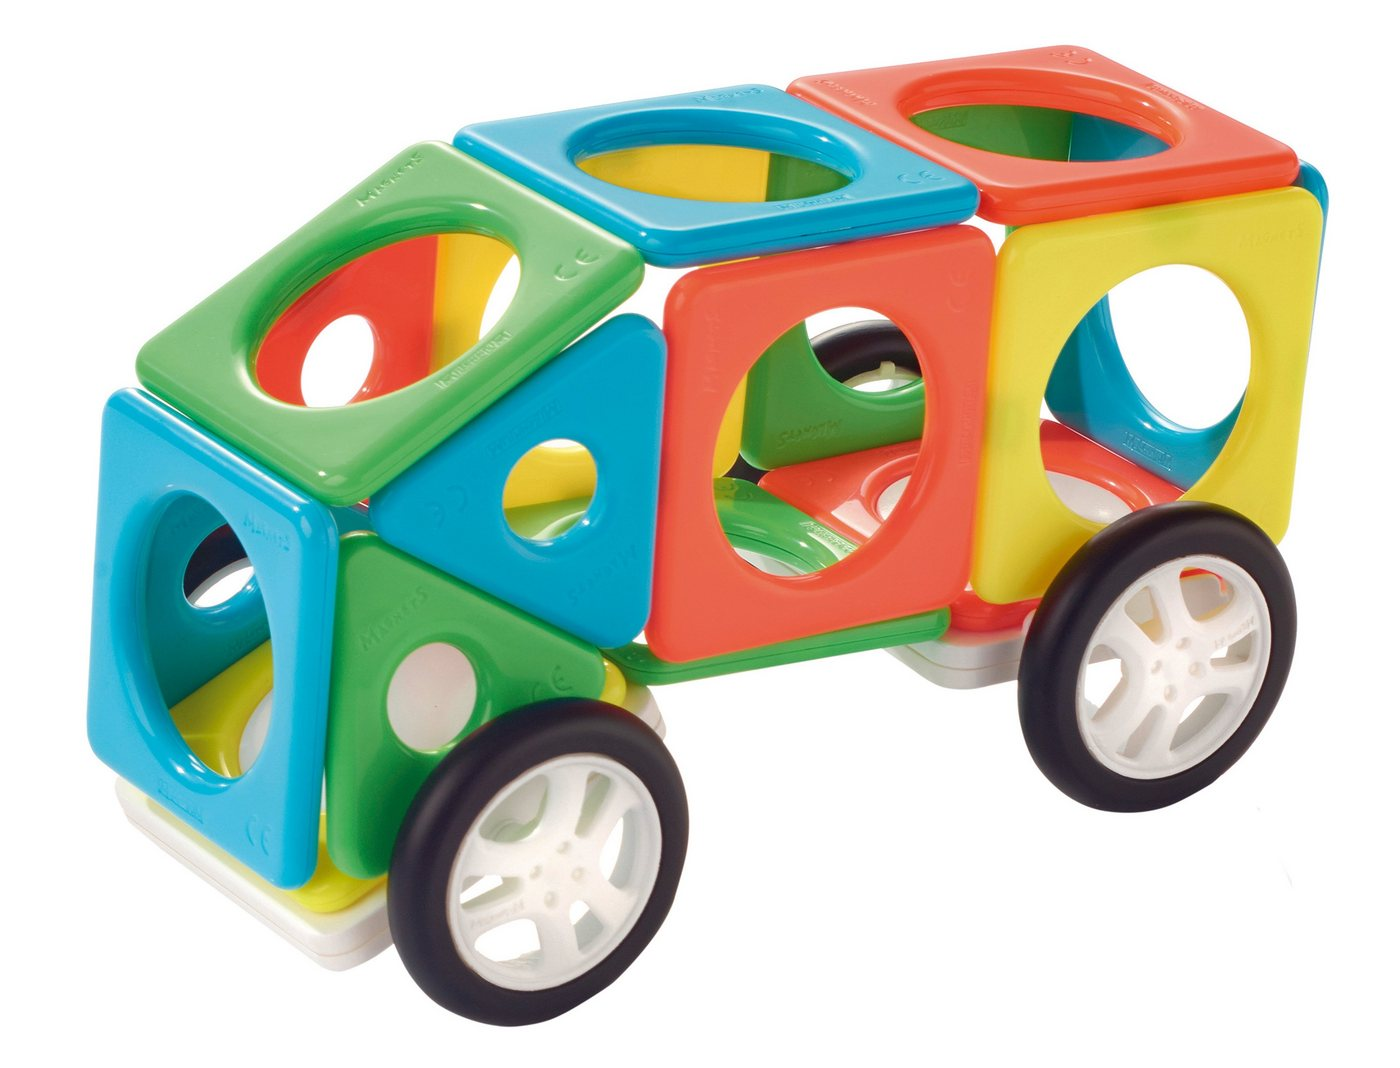 Millennium 22-teiliges Kreativ-Magnetbau-Set »M420 Magnets« - Preisvergleich